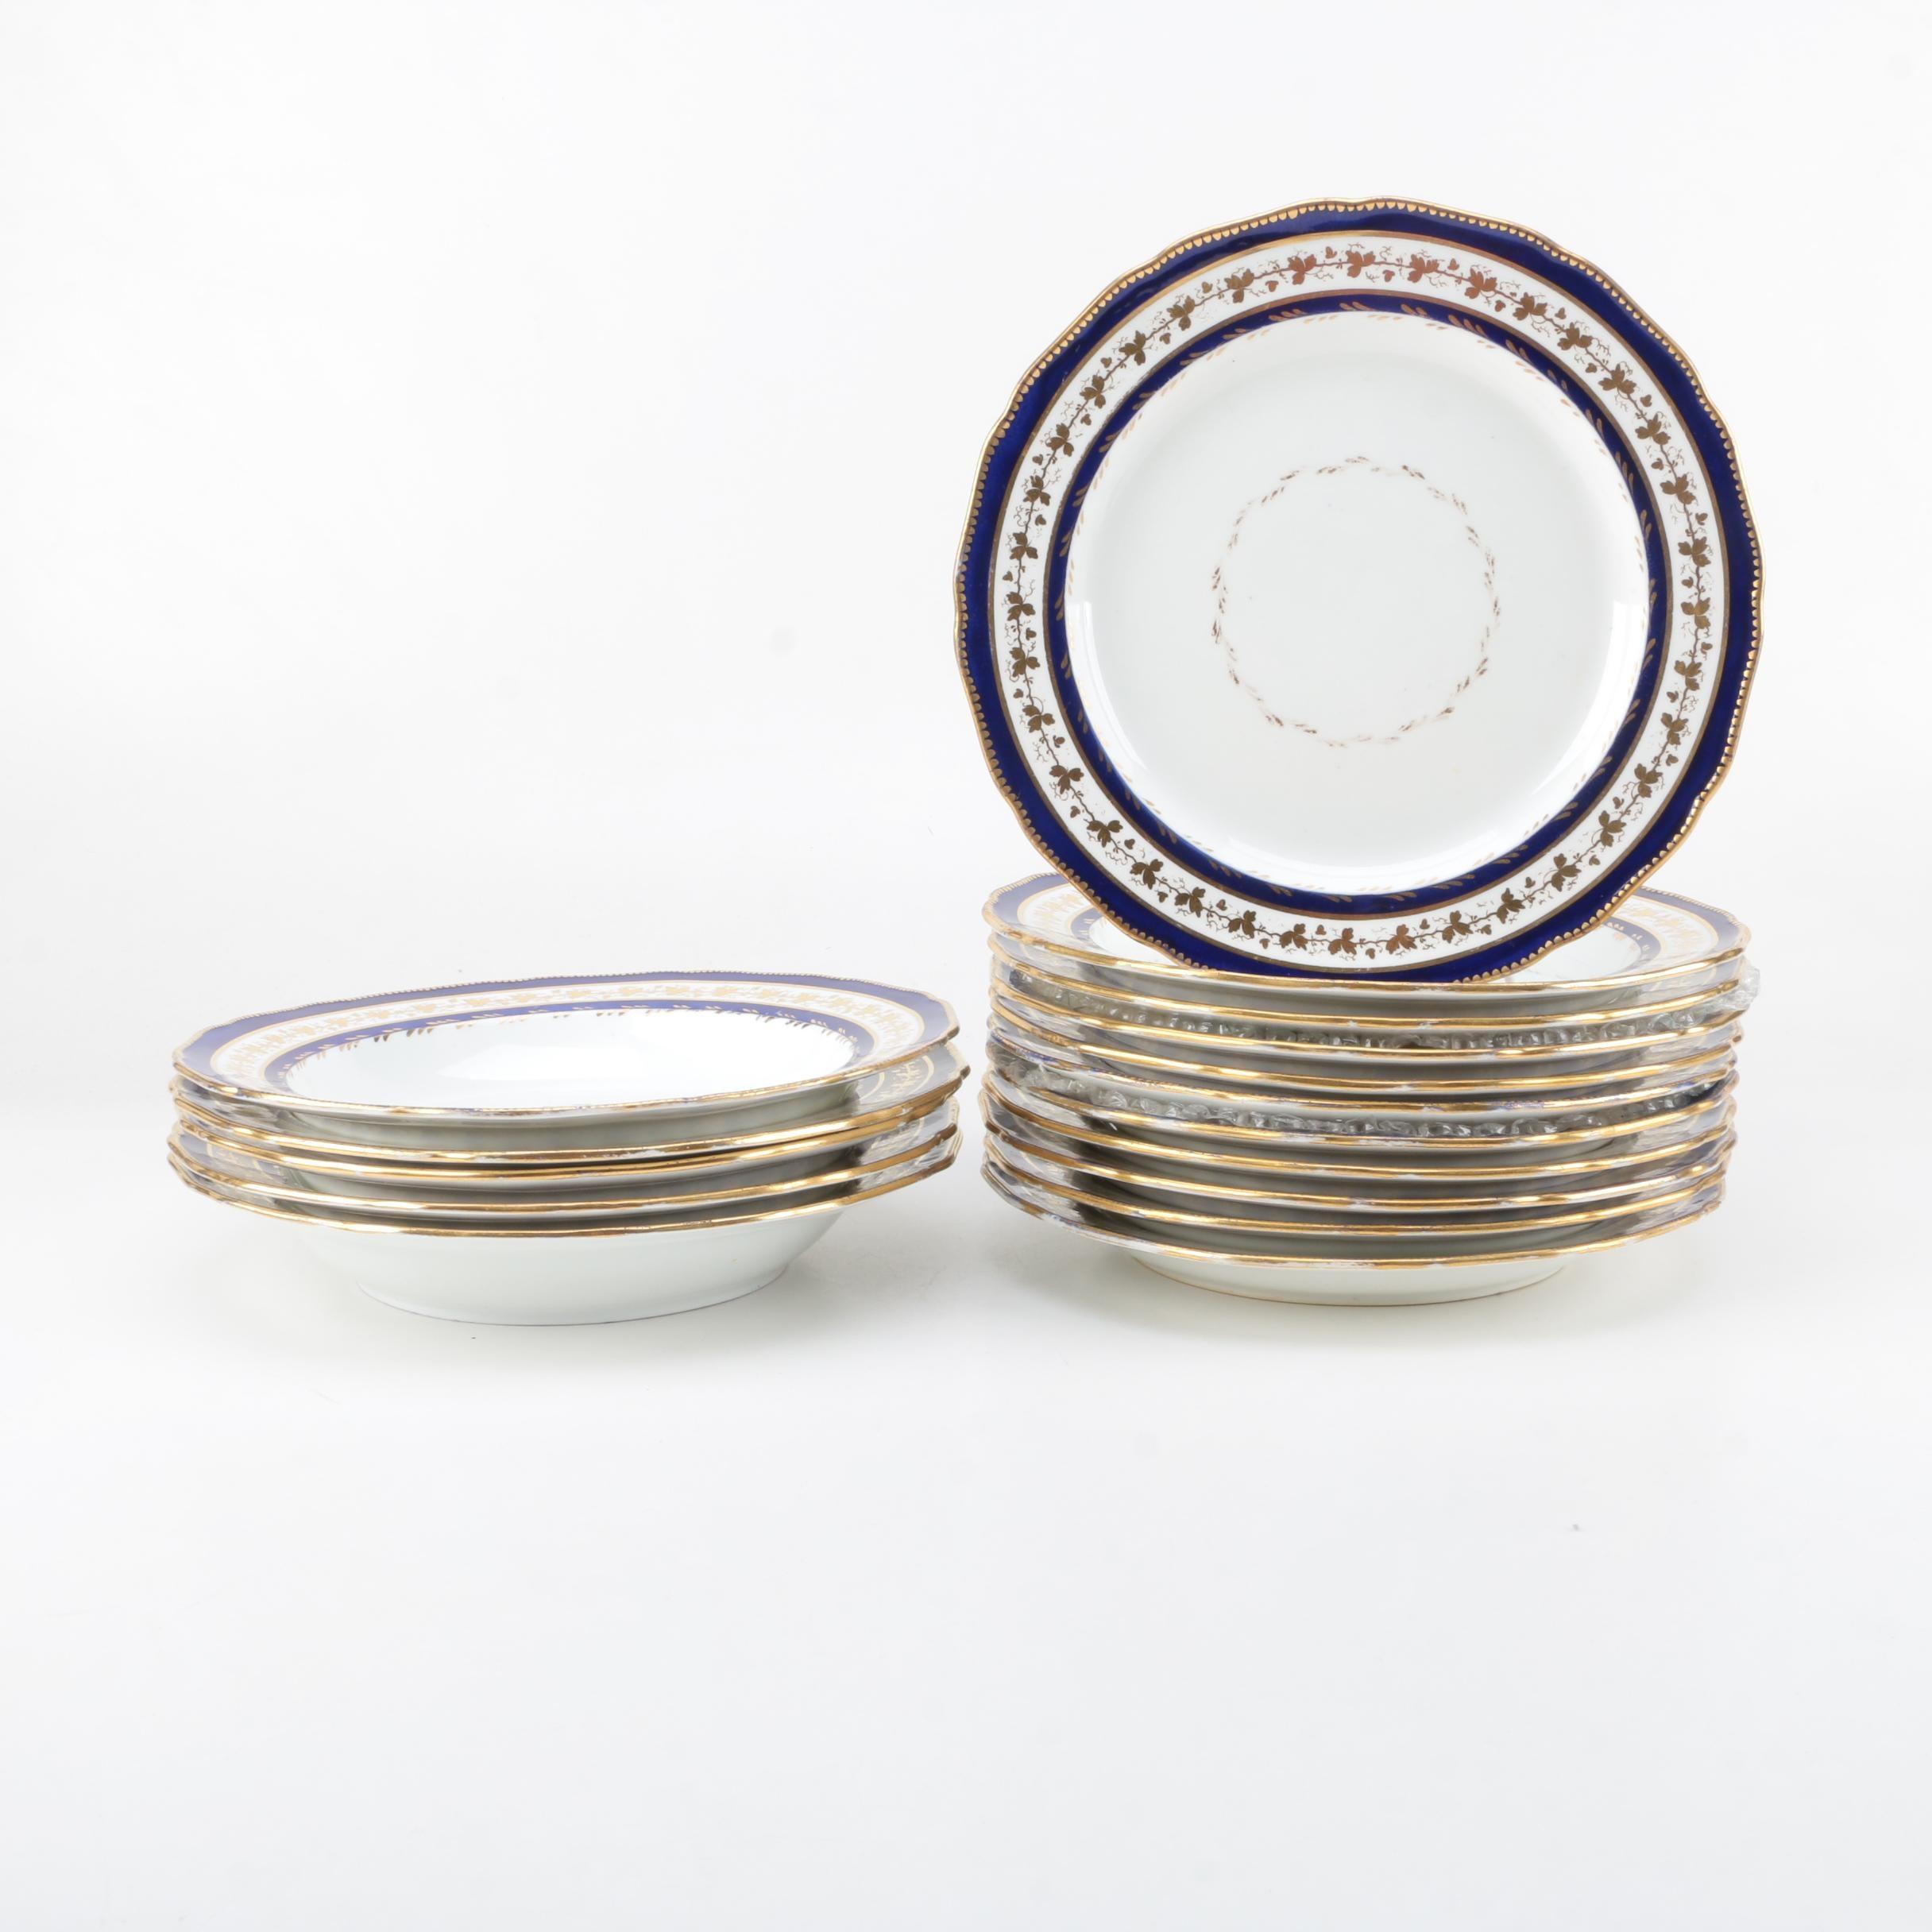 Antique Davenport Longport Staffordshire Dinner Plates and Bowls Circa 1820